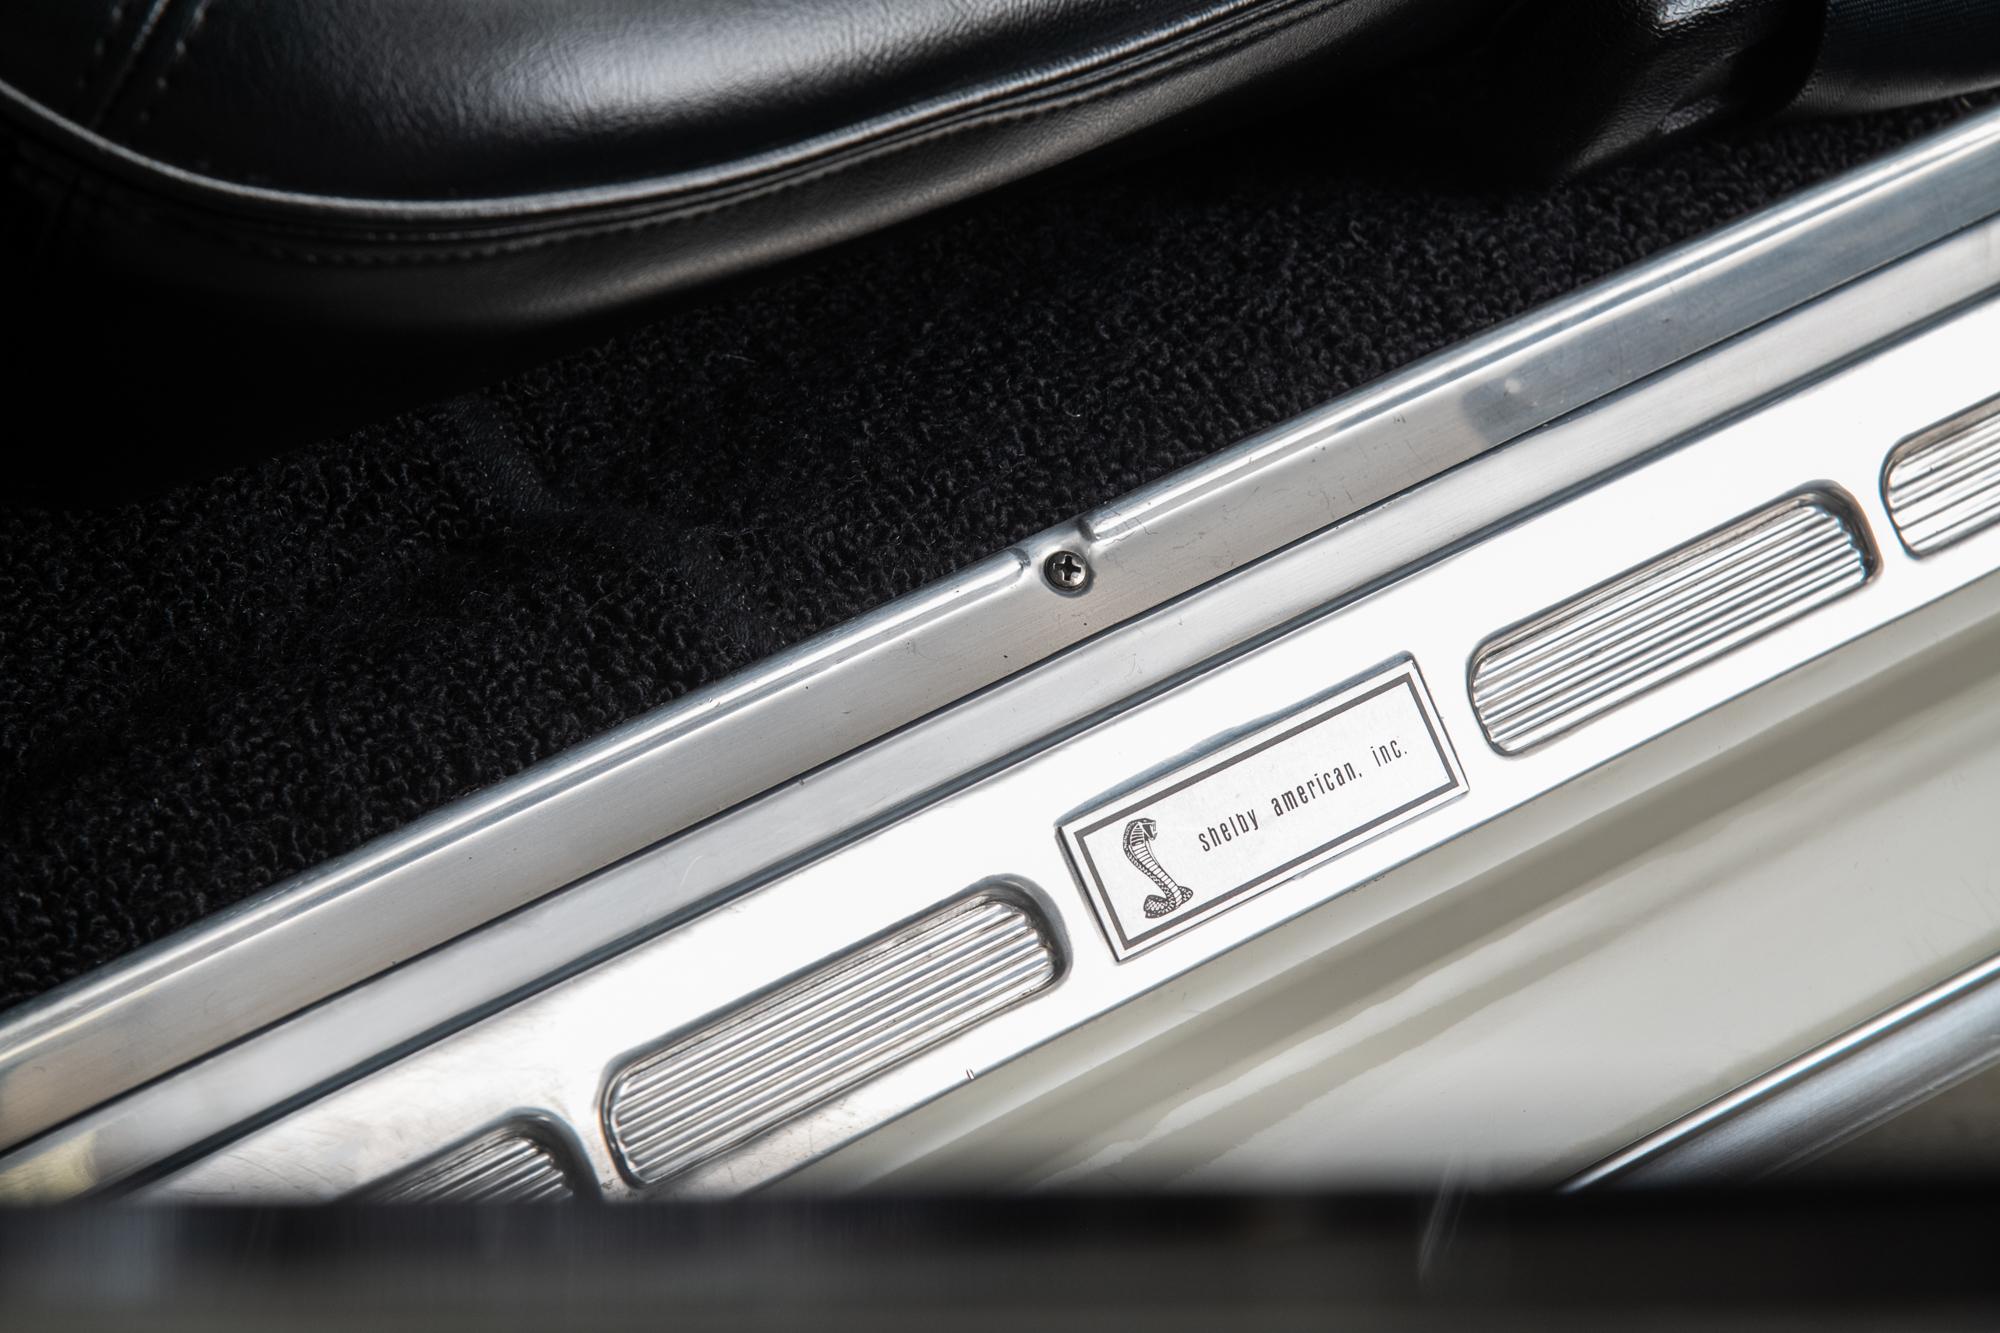 1968 Shelby GT500KR , WHITE, VIN 8T03R215917-04147, MILEAGE 86890